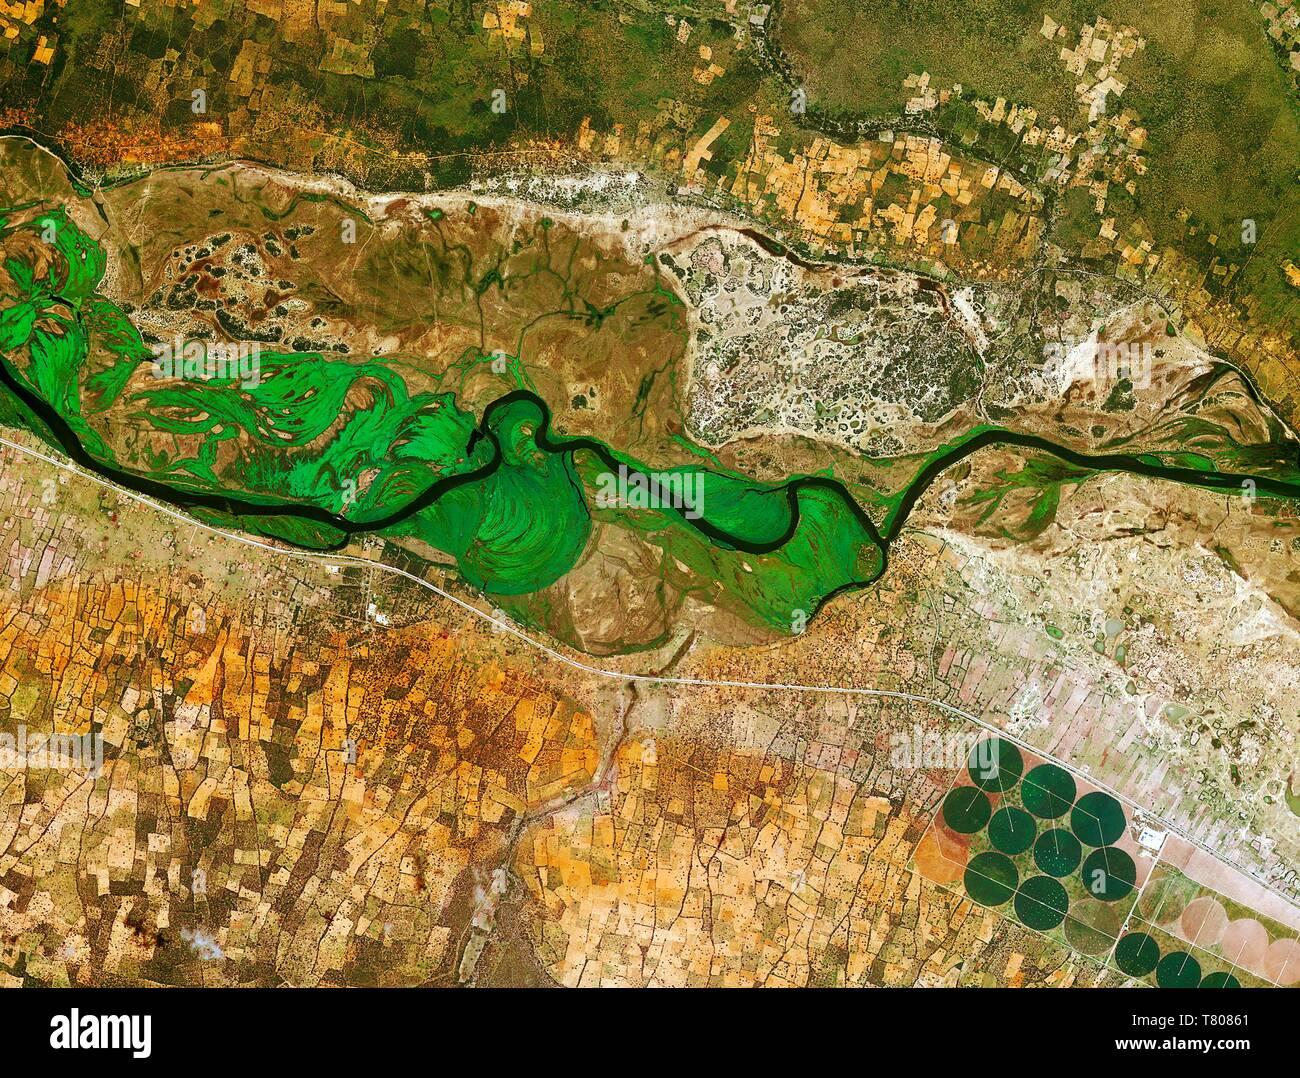 Okavango River, Namibia and Angola, satellite image - Stock Image